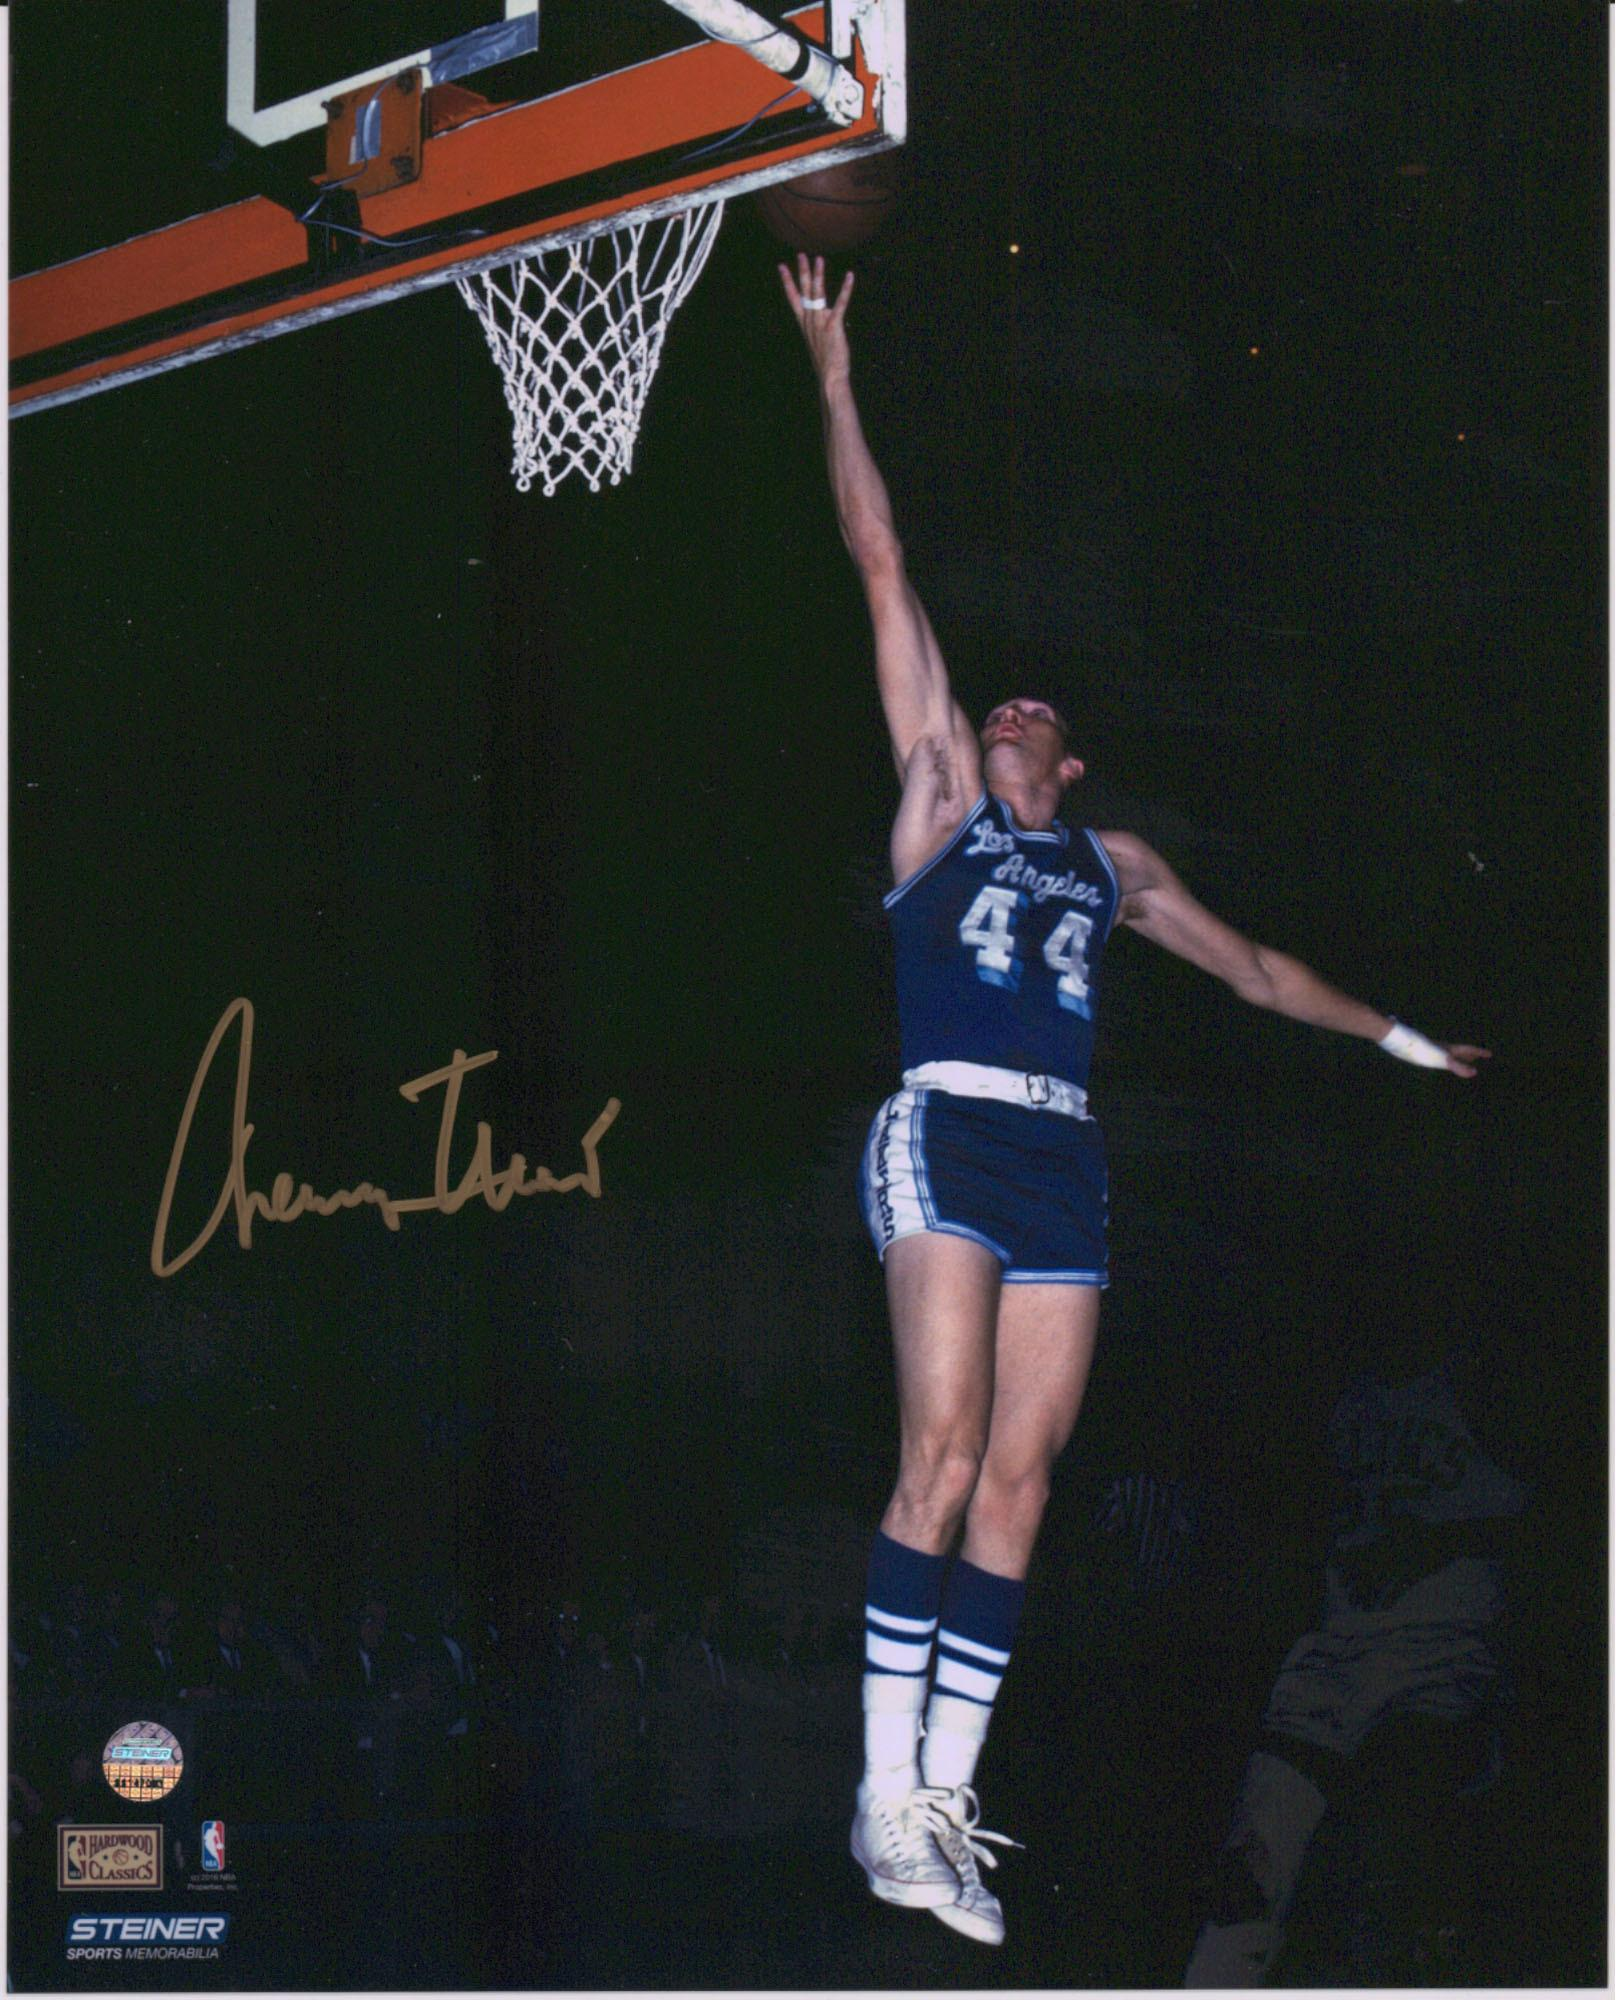 DK248 Elgin Baylor /& Wilt Chamberlain /& Jerry West Lakers 8x10 11x14 16x20 Photo